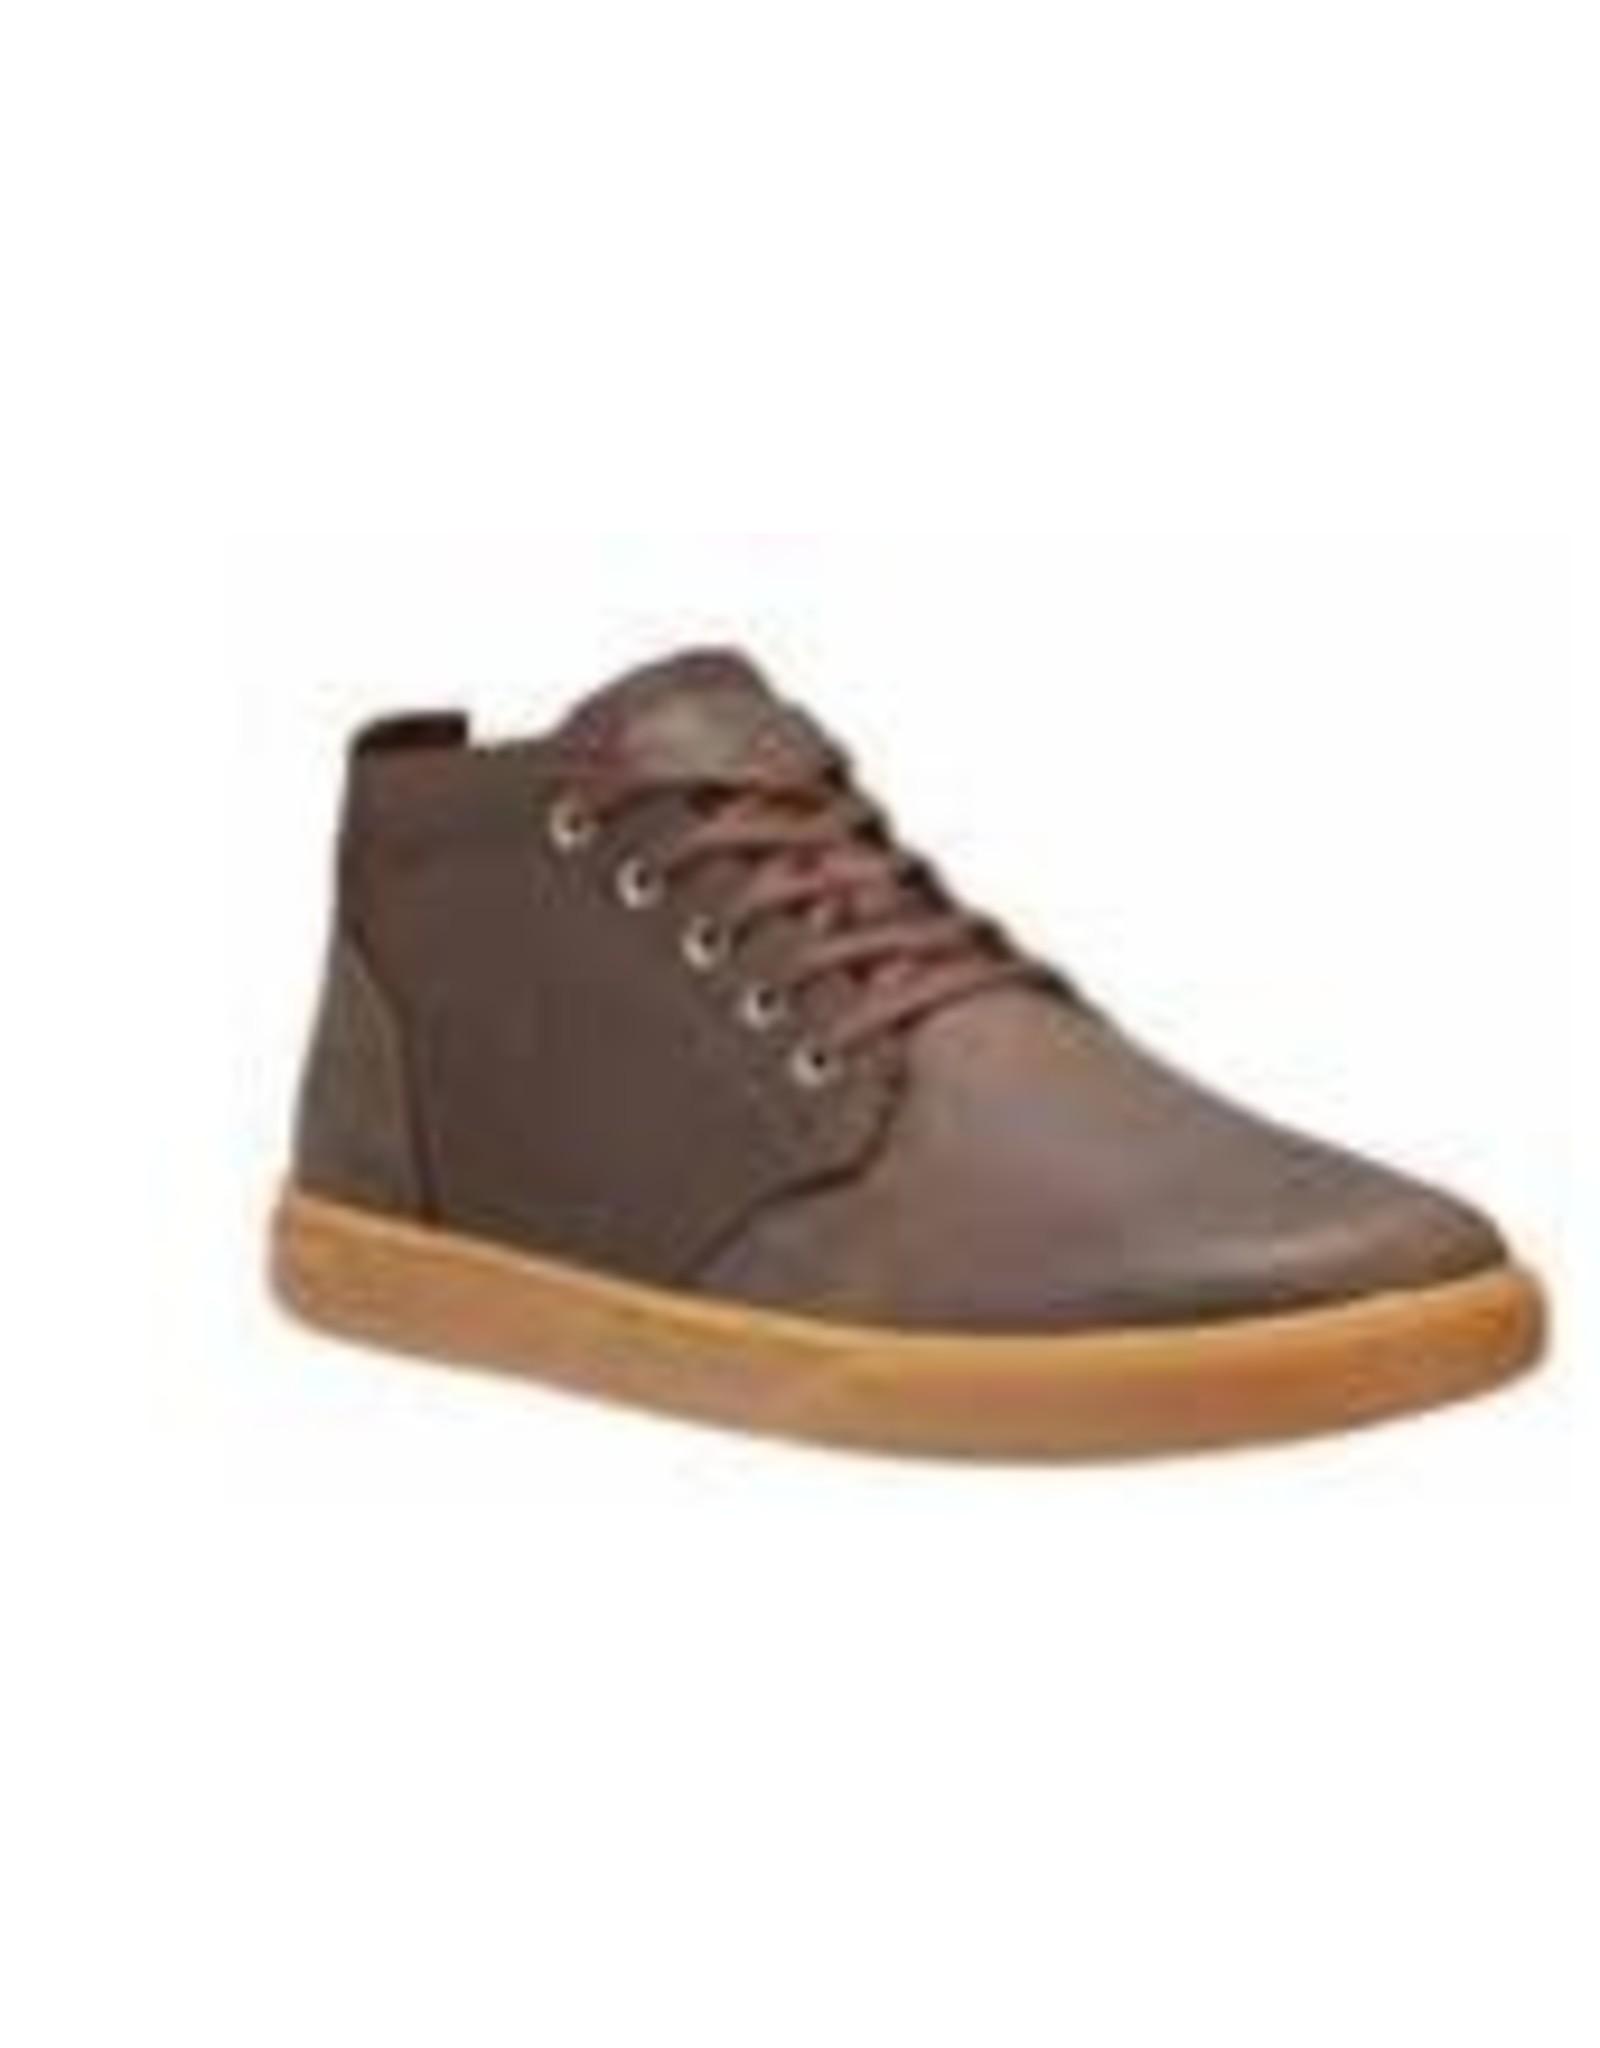 Timberland Men's Groveton Leather/Fabric - 19AF